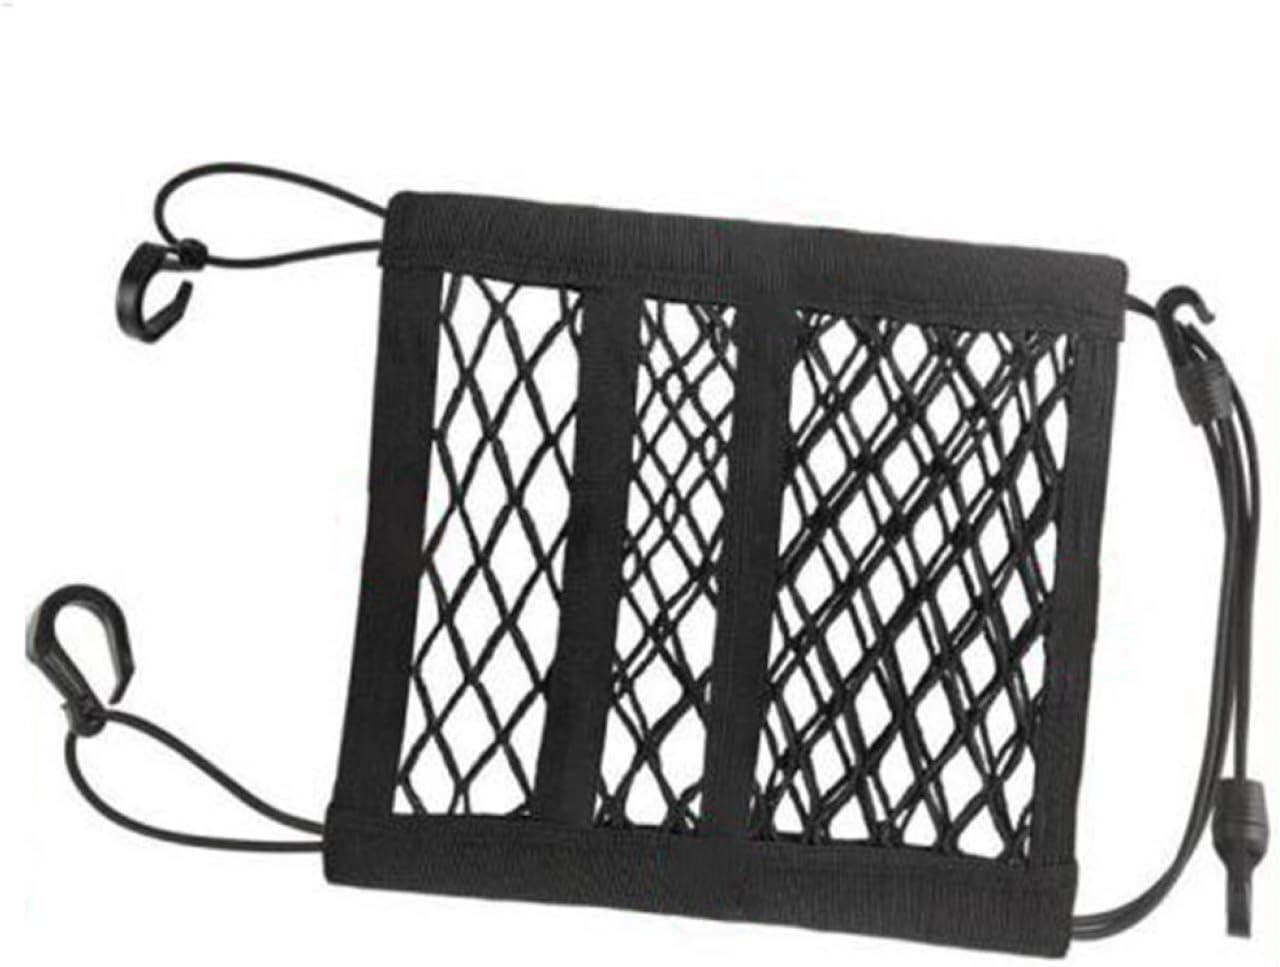 Accessories Parts WFAL unusual Universal Car Trunk Storage Cargo Luggage Elastic Mesh Net Bag Holder Pocket None one size BK2